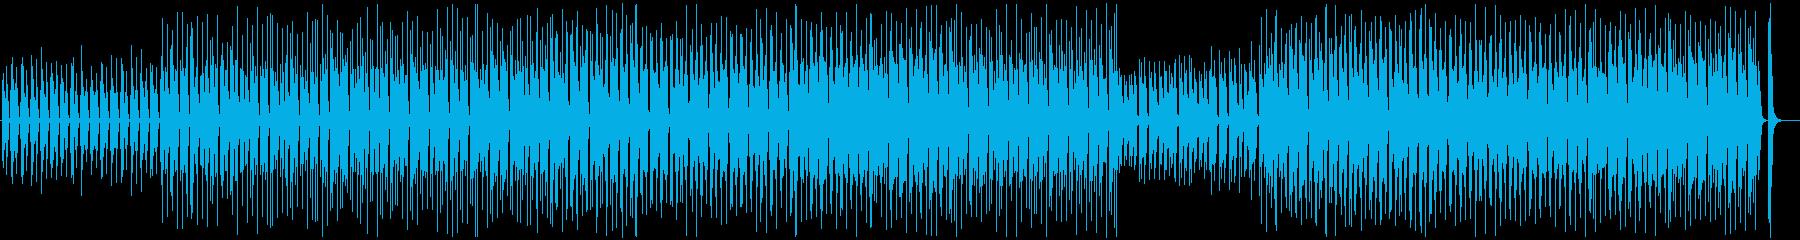 Refreshing, relaxing, ukulele, whistling's reproduced waveform